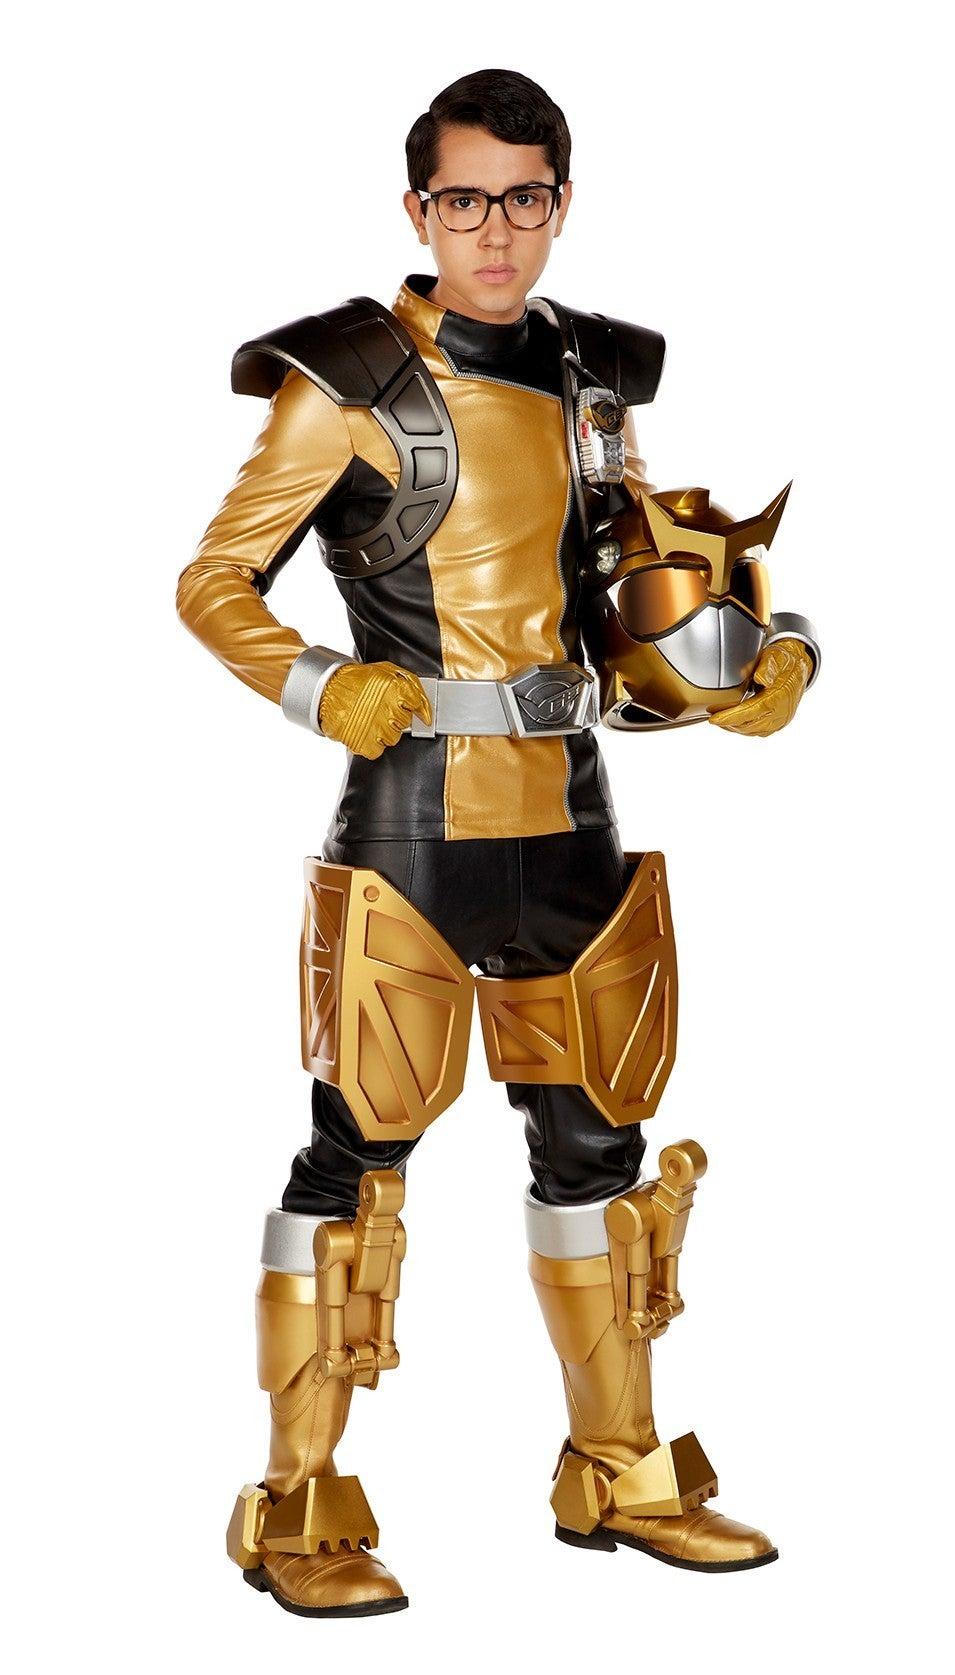 Power-Rangers-Gold-Ranger-Abraham-Rodriguez-2